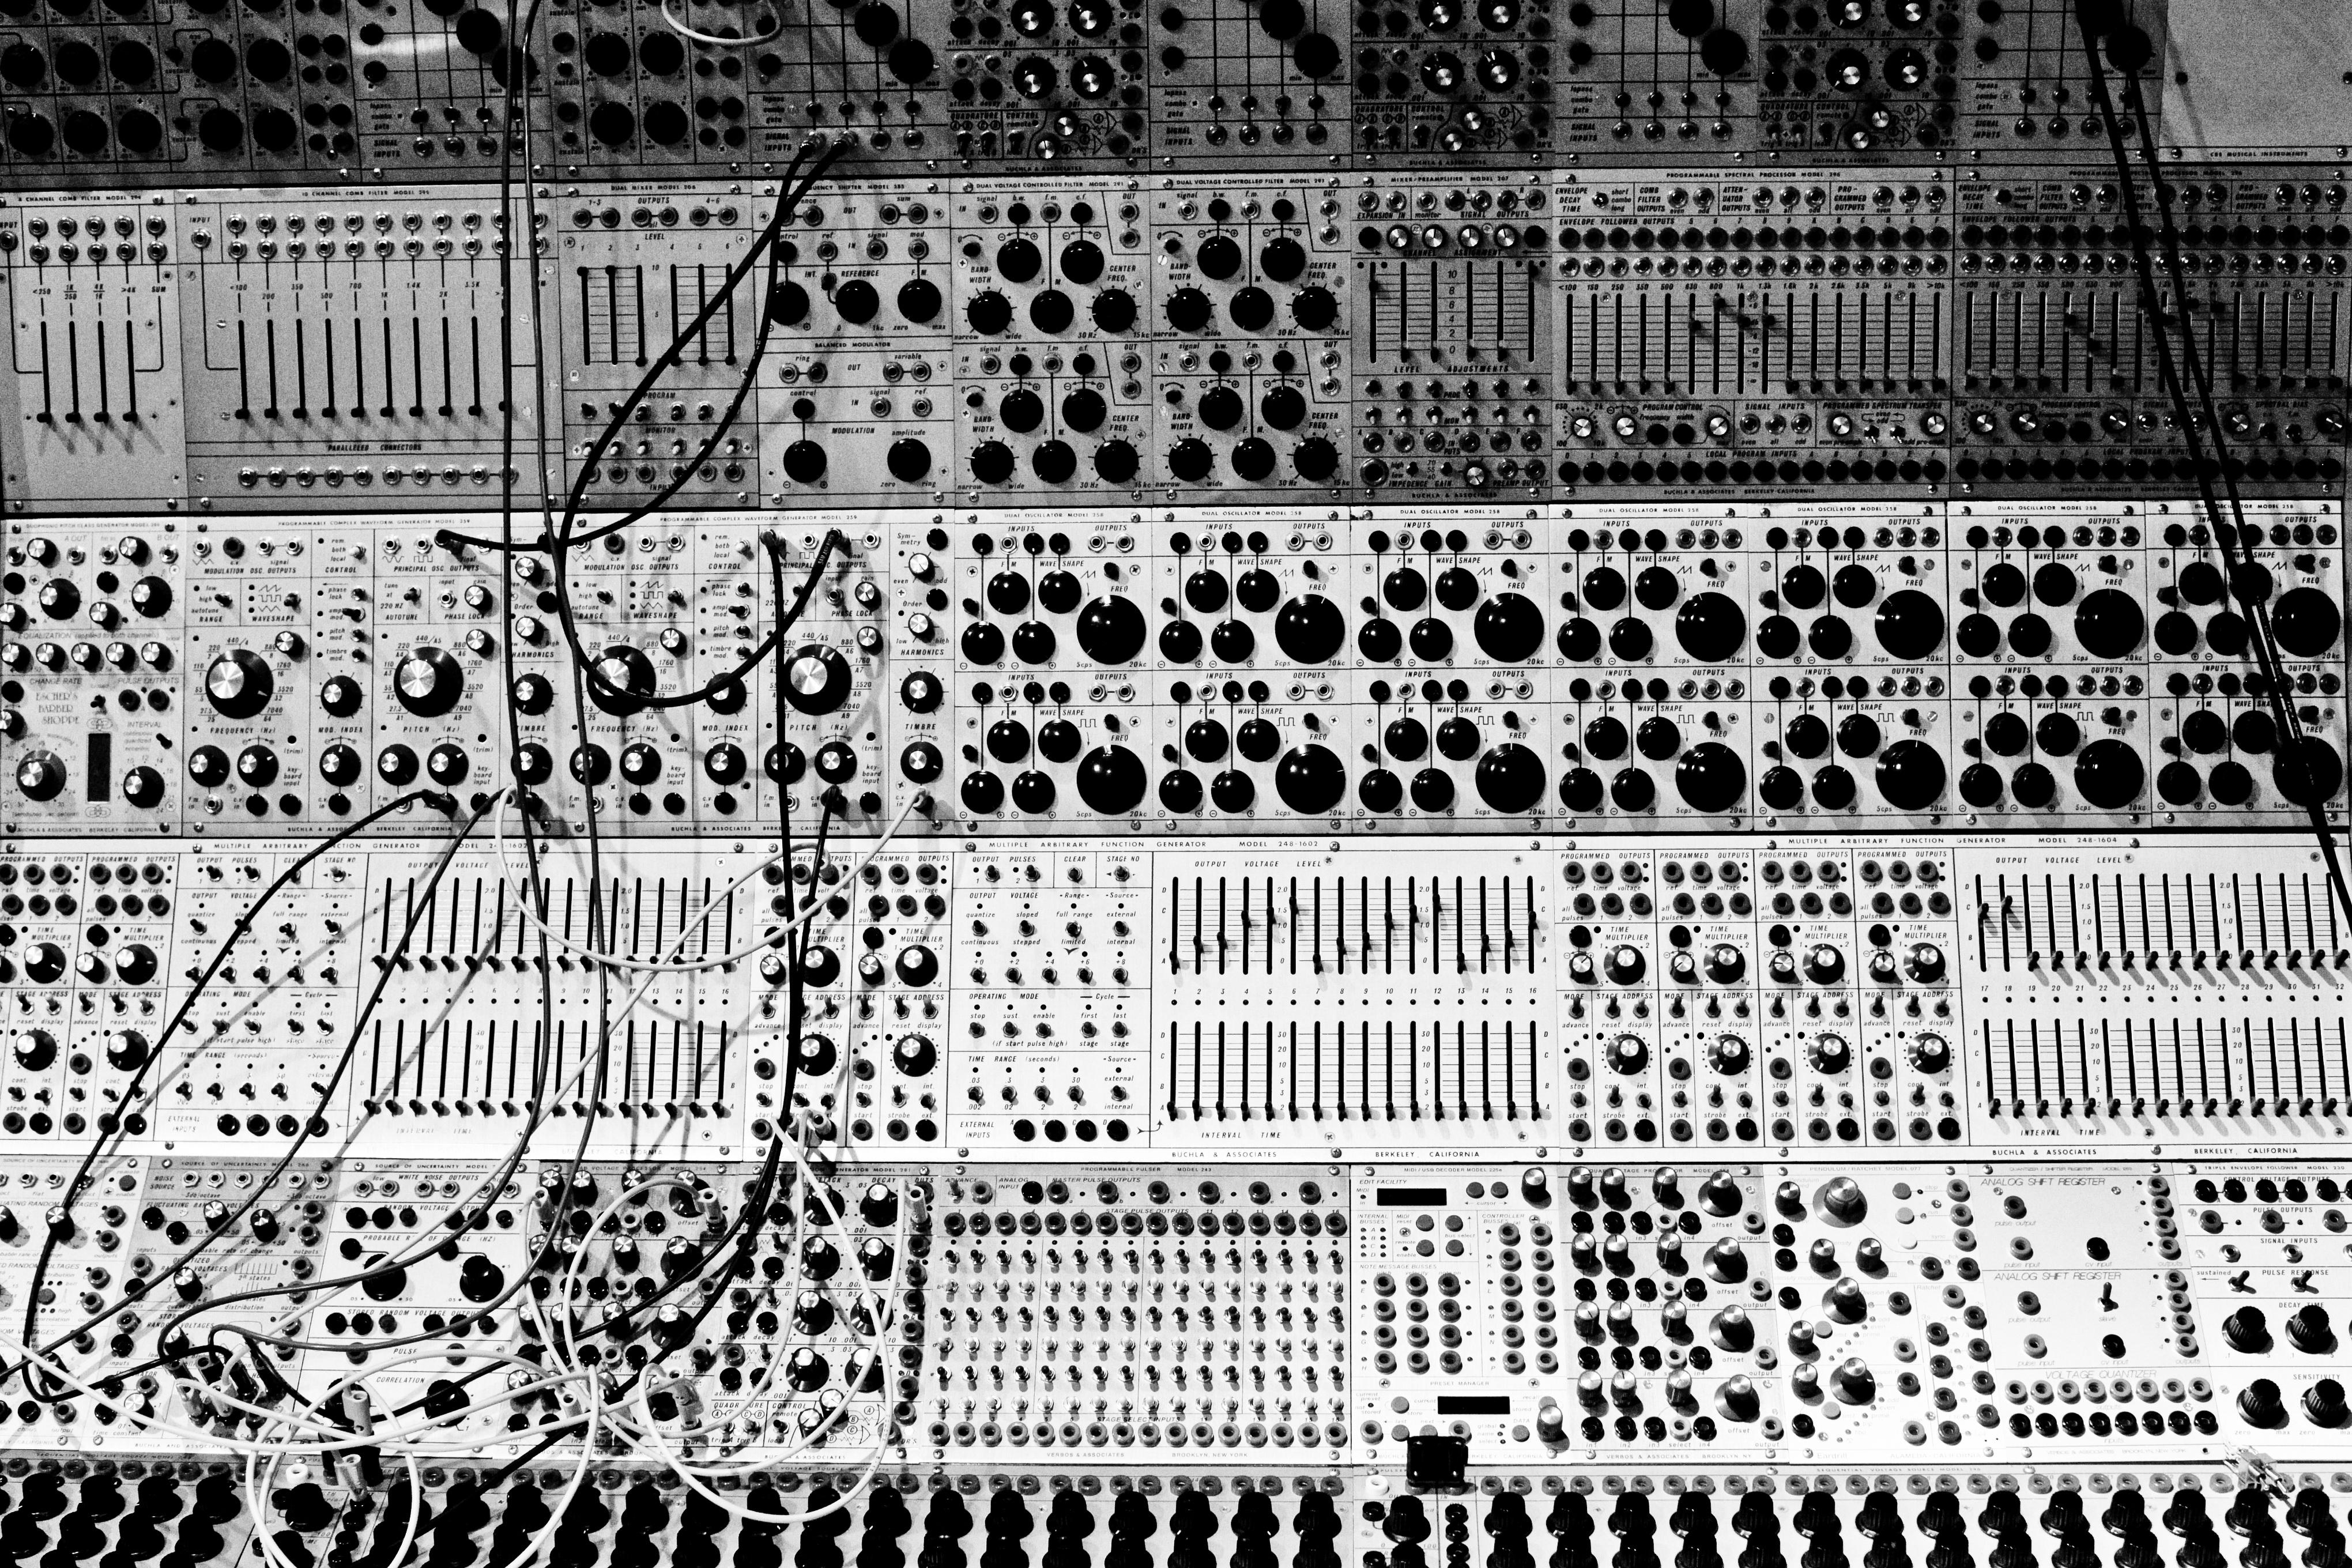 49] Modular Synthesizer Wallpaper on WallpaperSafari 4080x2720